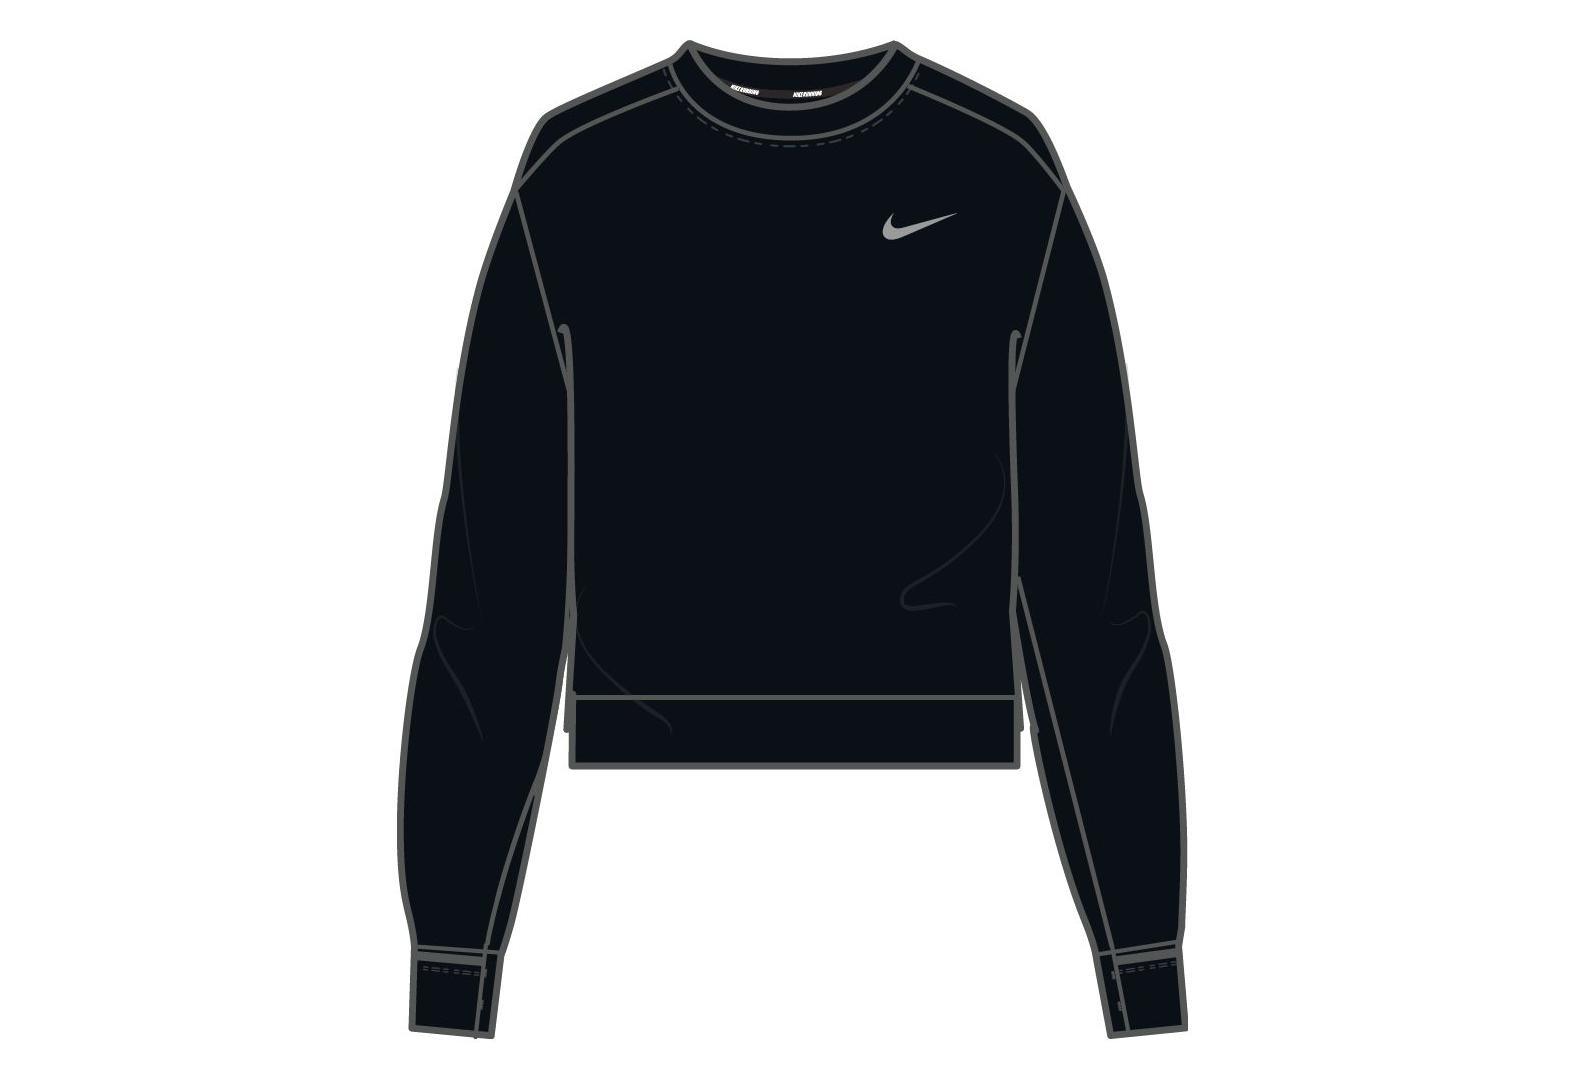 4d6bce8ad Nike Therma Sphere Elet Women's Long Sleeves Jersey Black | Alltricks.com